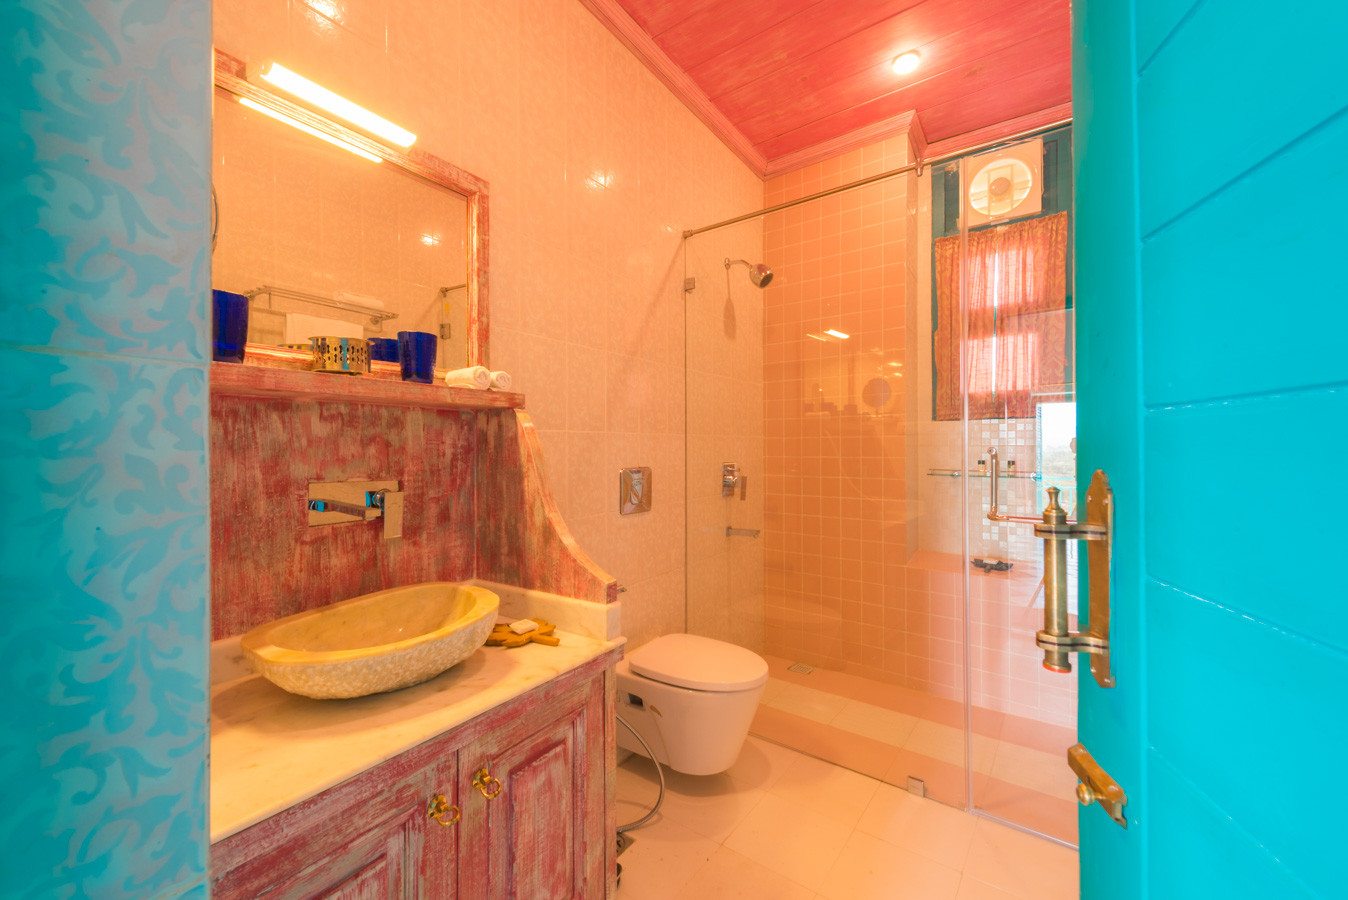 Room-1_Unbound_Jungalow_9.jpg